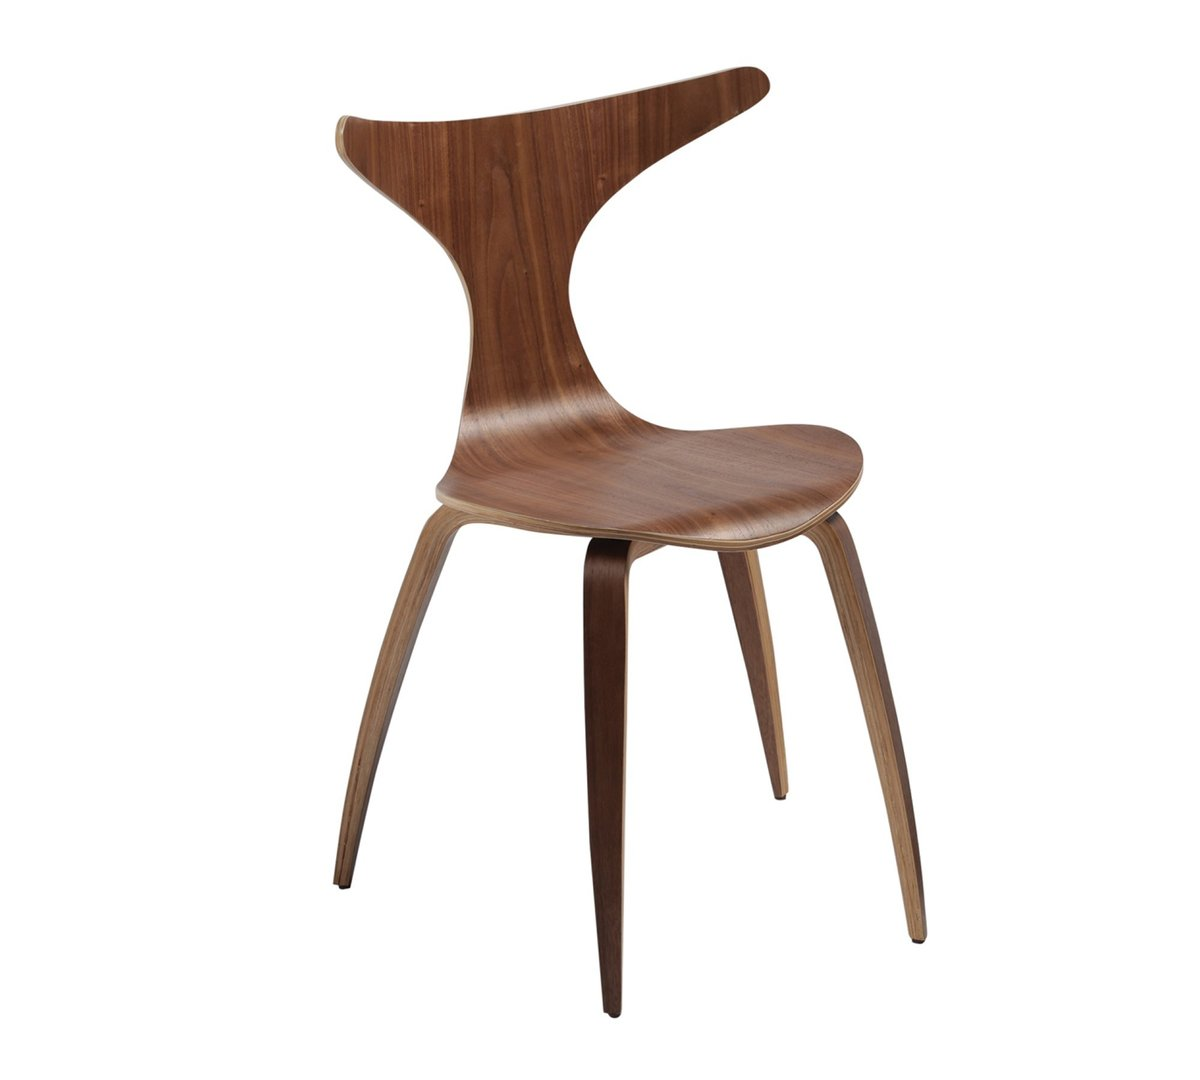 awesome stuhl dolphin holz von dan form erset with stuhl holz